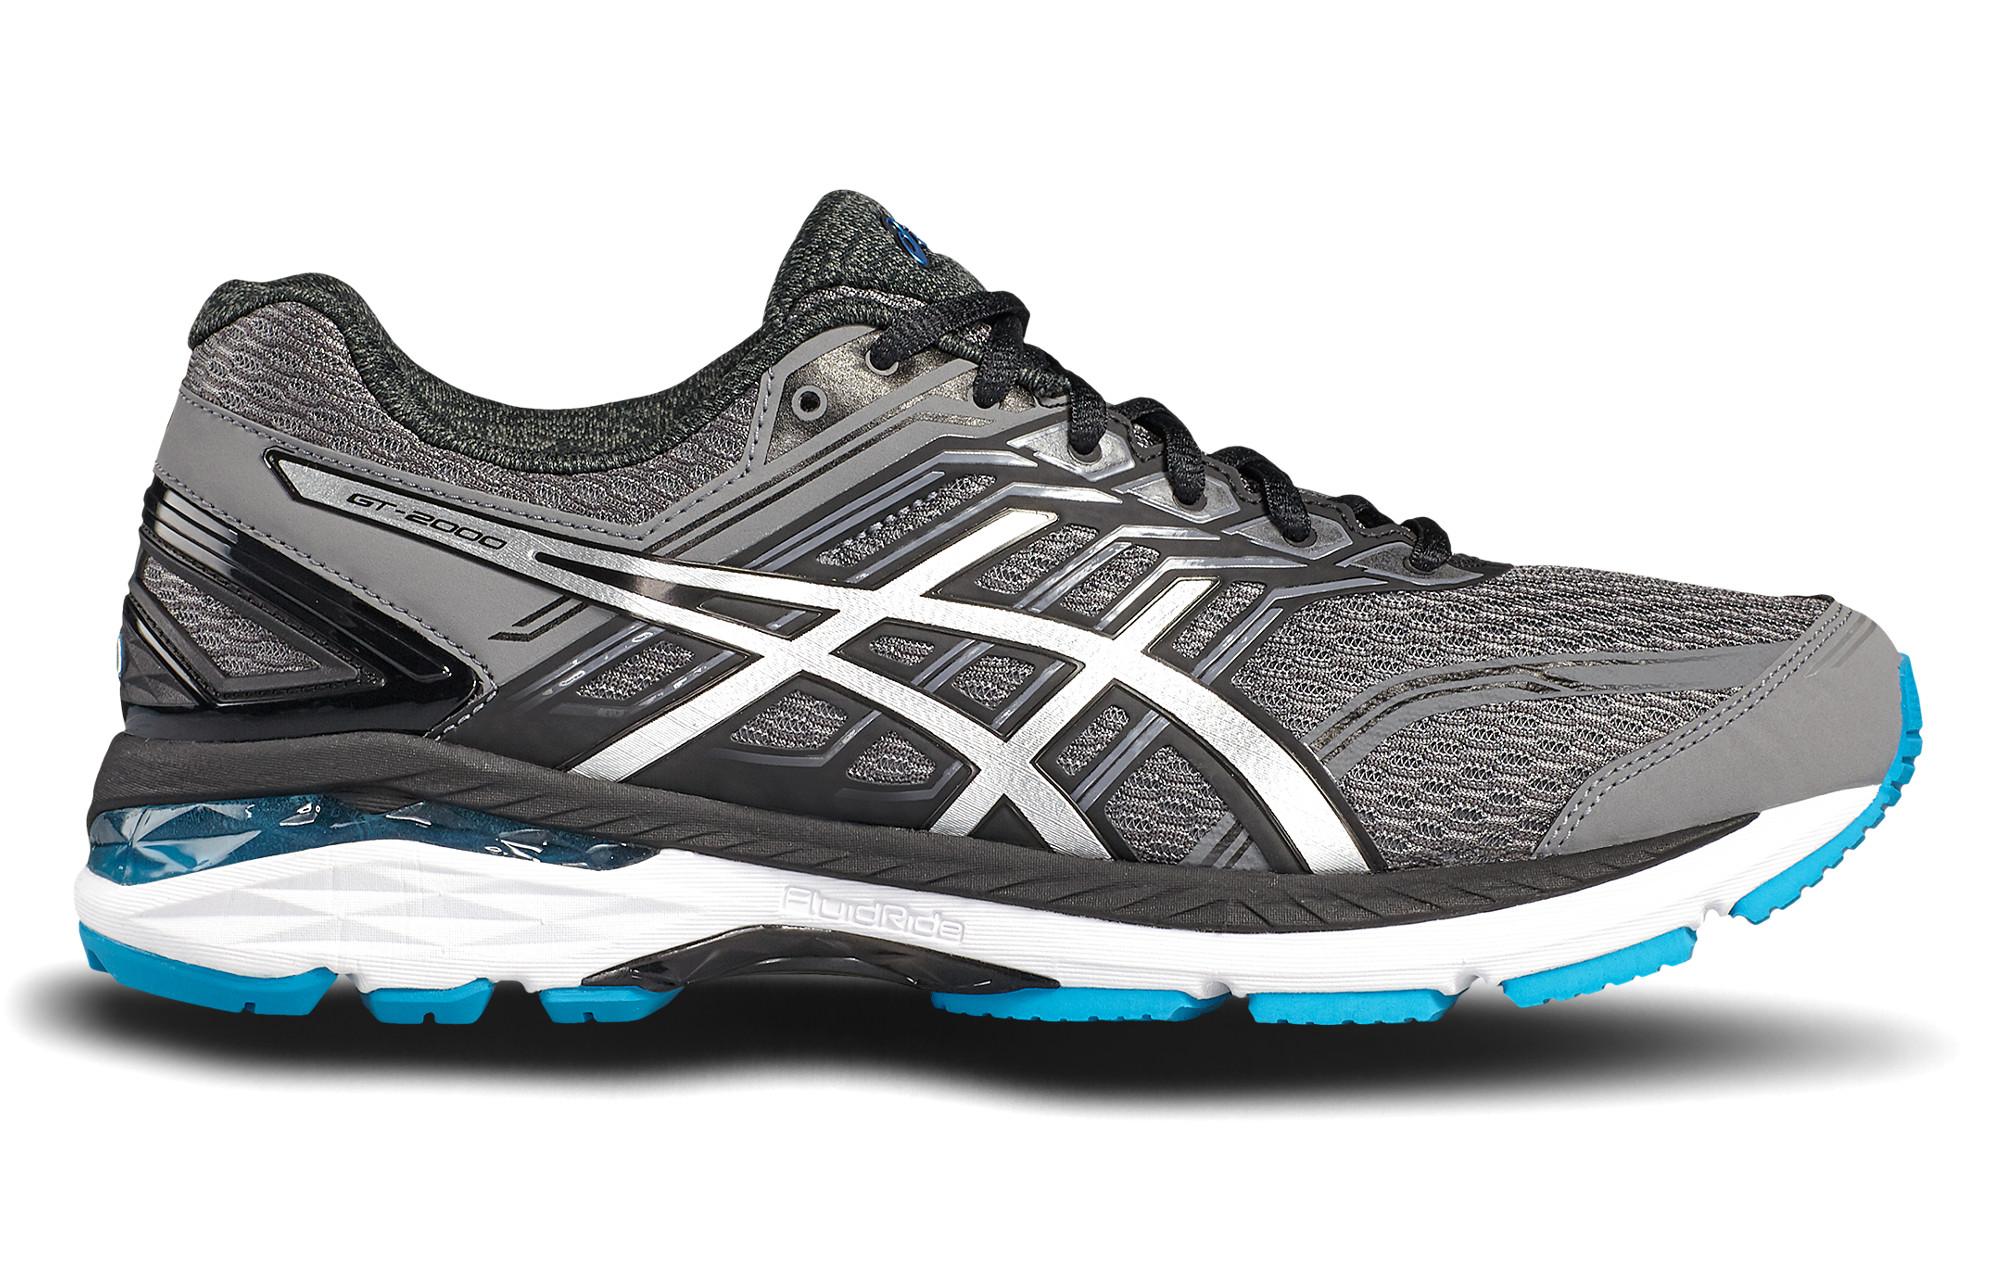 chaussures de running asics gt 2000 5 gris. Black Bedroom Furniture Sets. Home Design Ideas